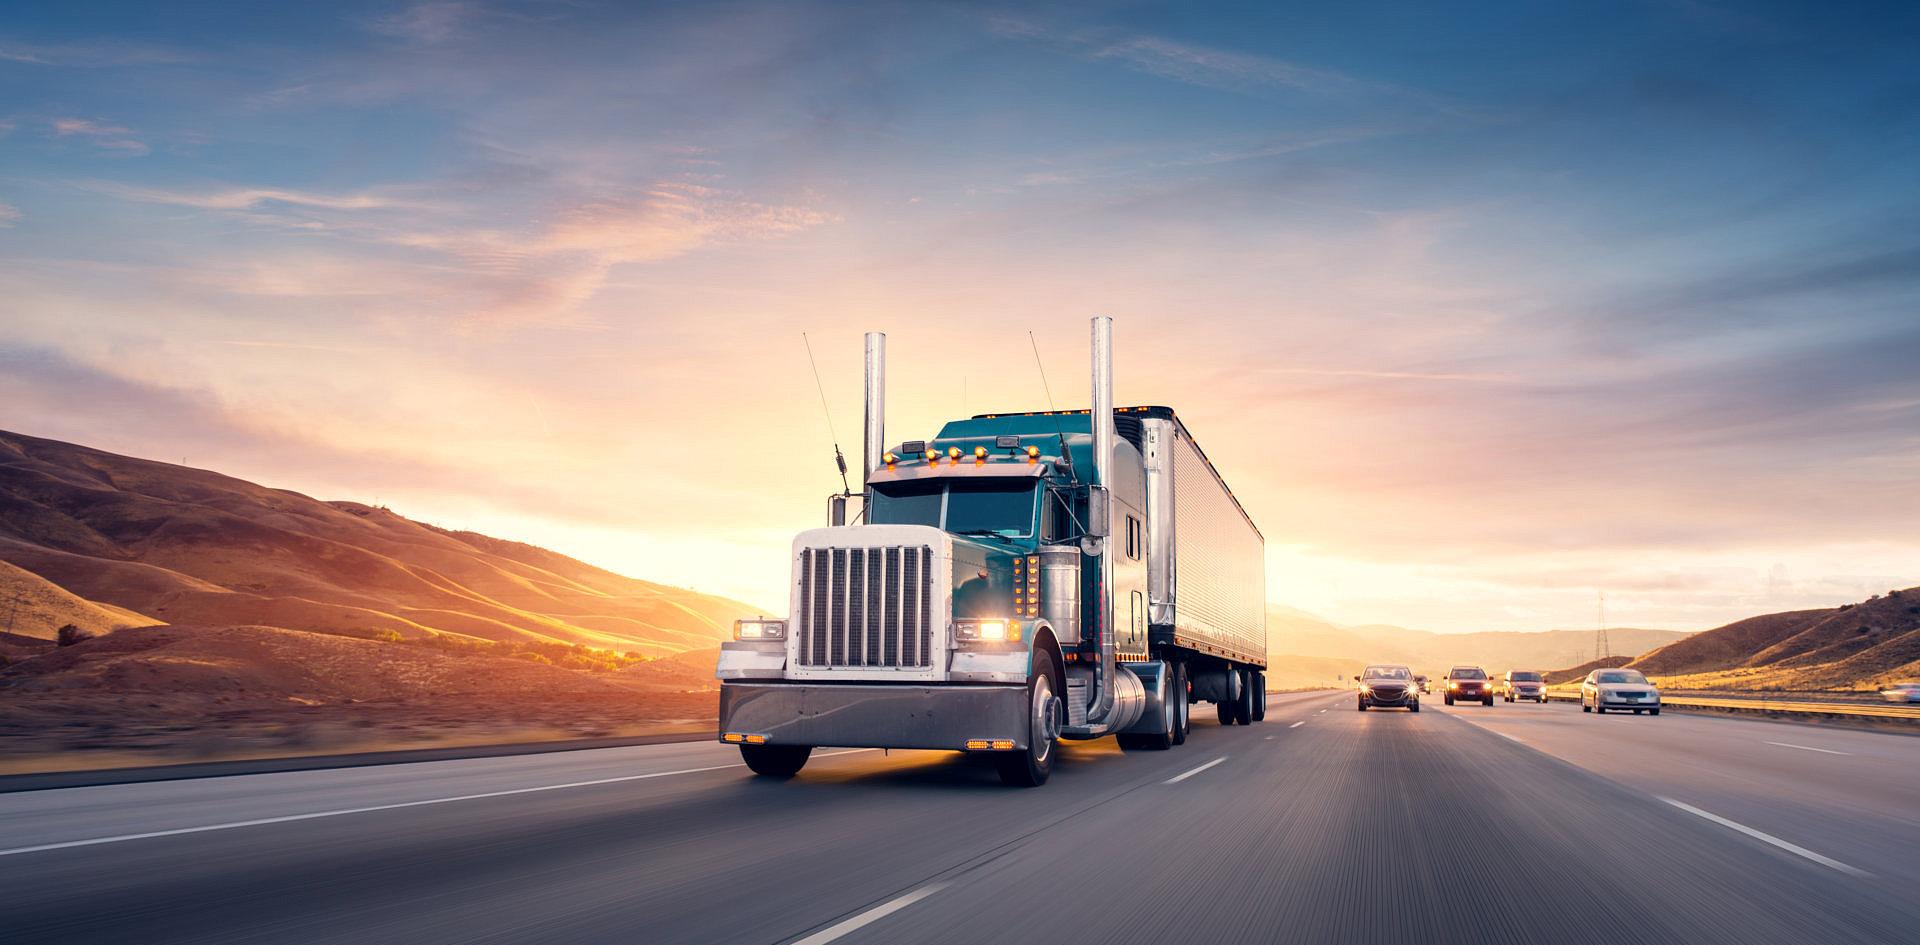 big truck on a road